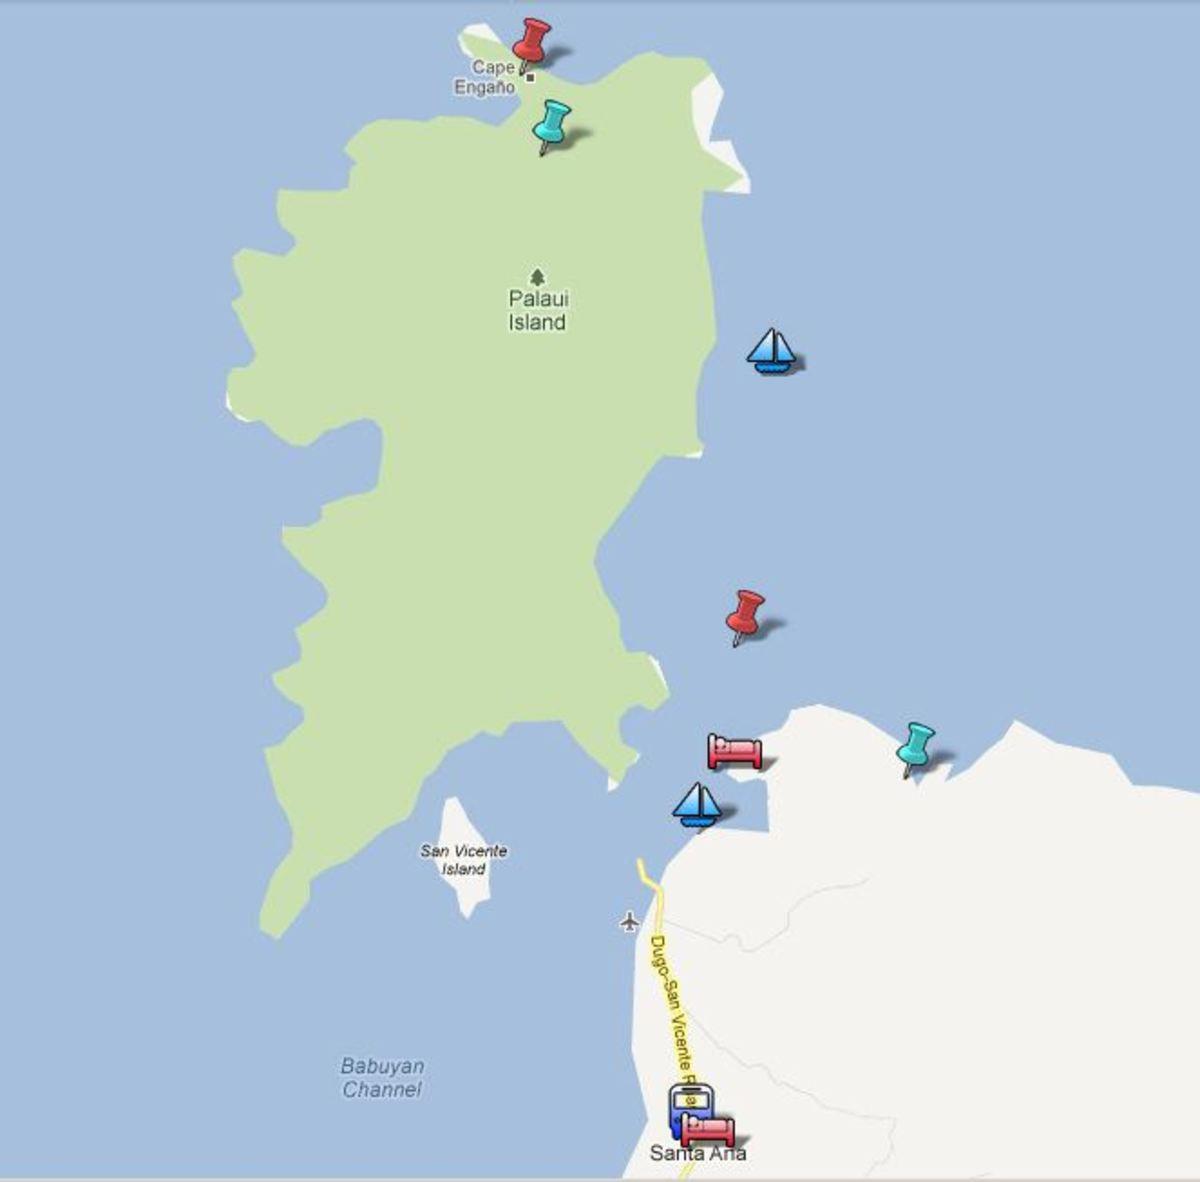 Palaui Cagayan Ilocos Google tour map by munchwaffle